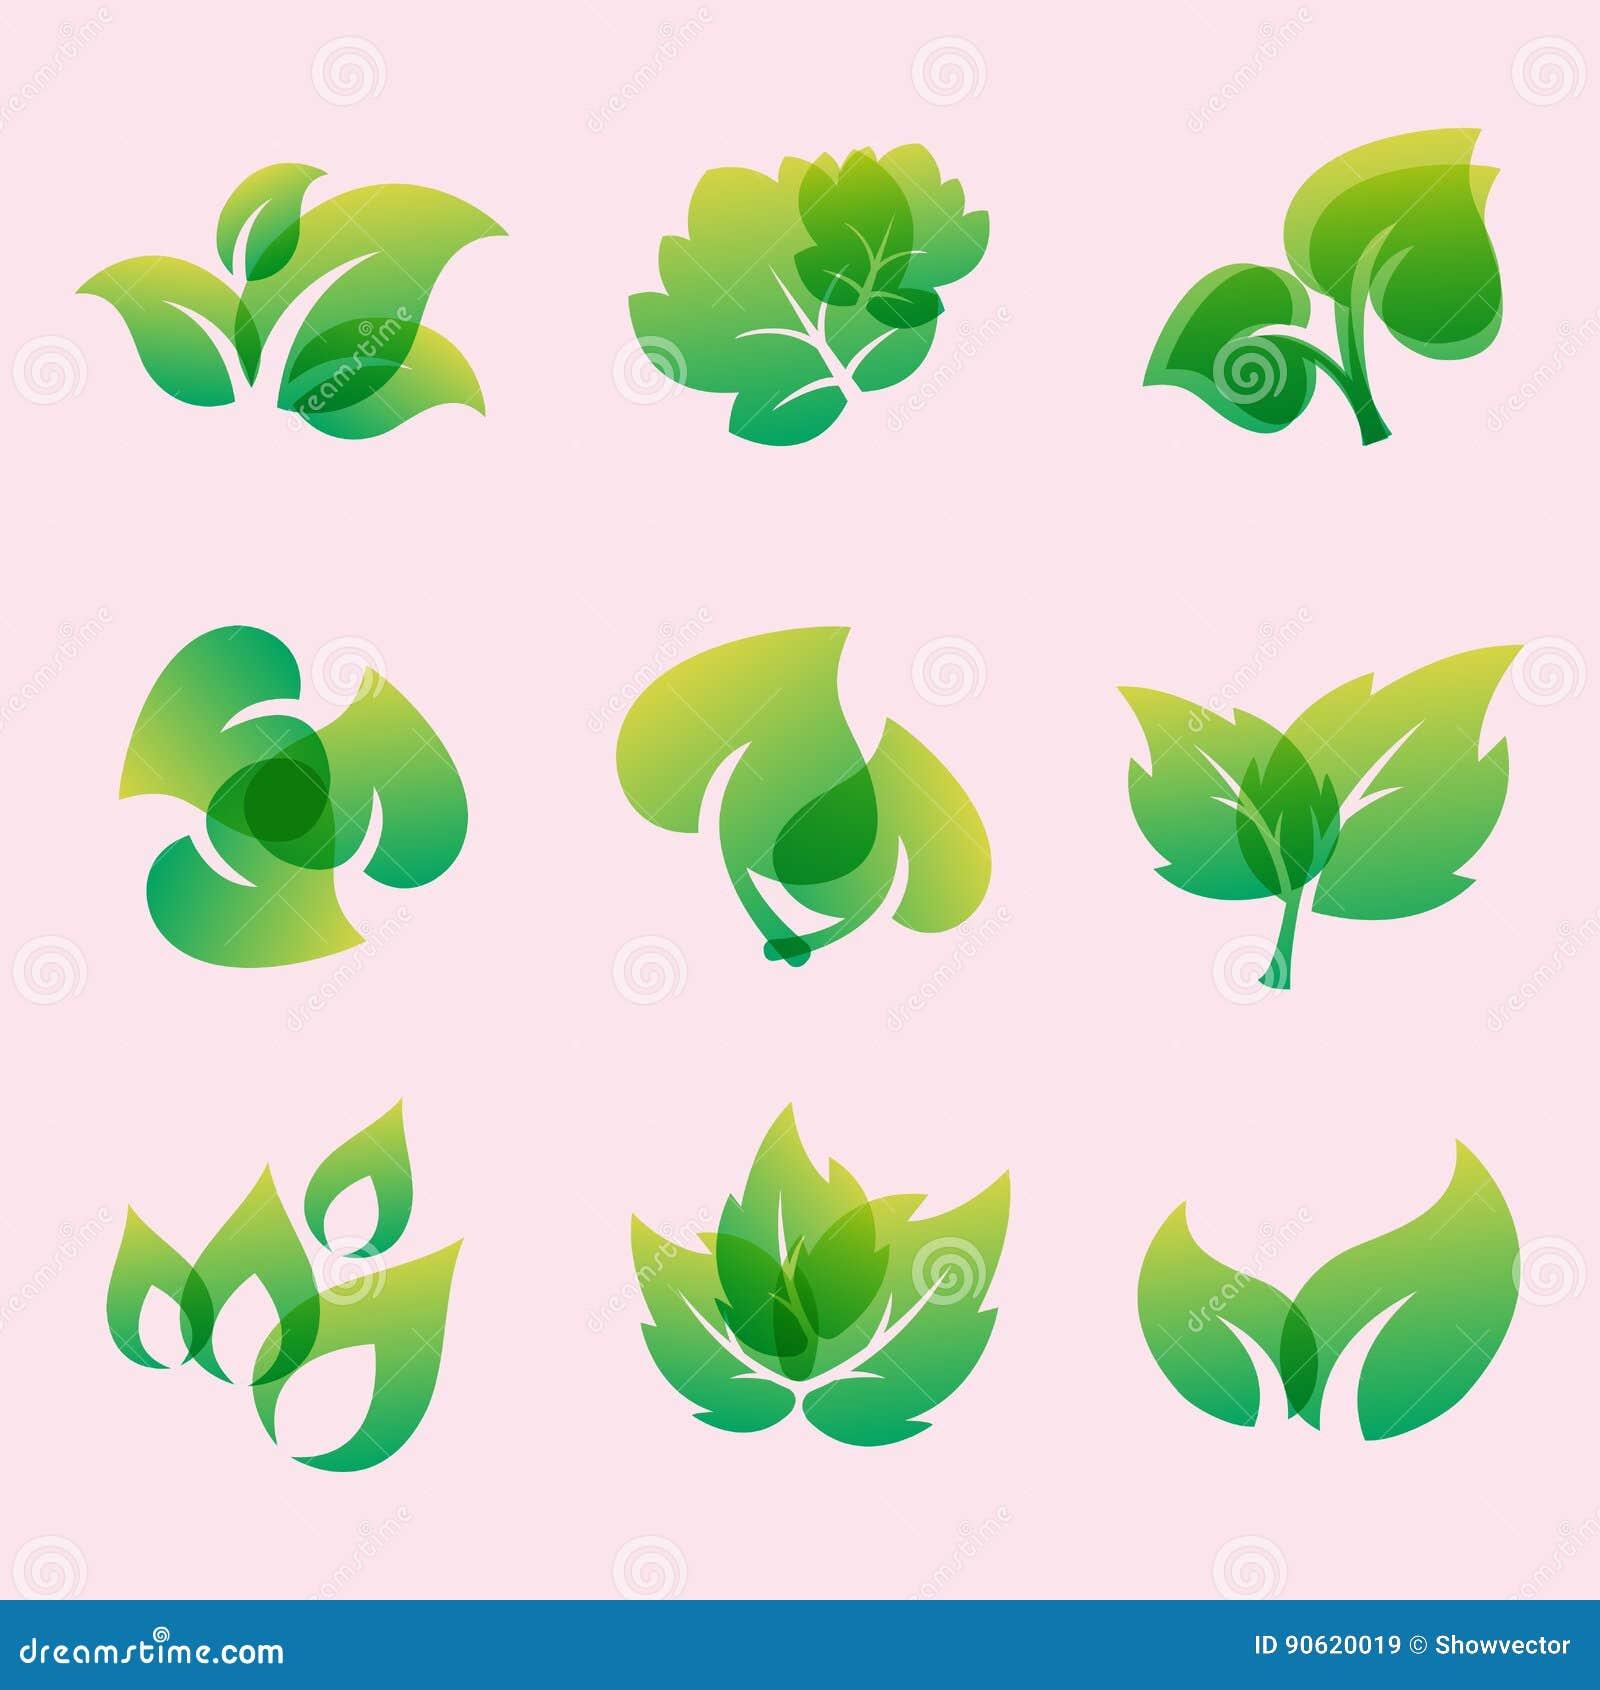 Green Leaf Eco Design Friendly Nature Elegance Symbol And